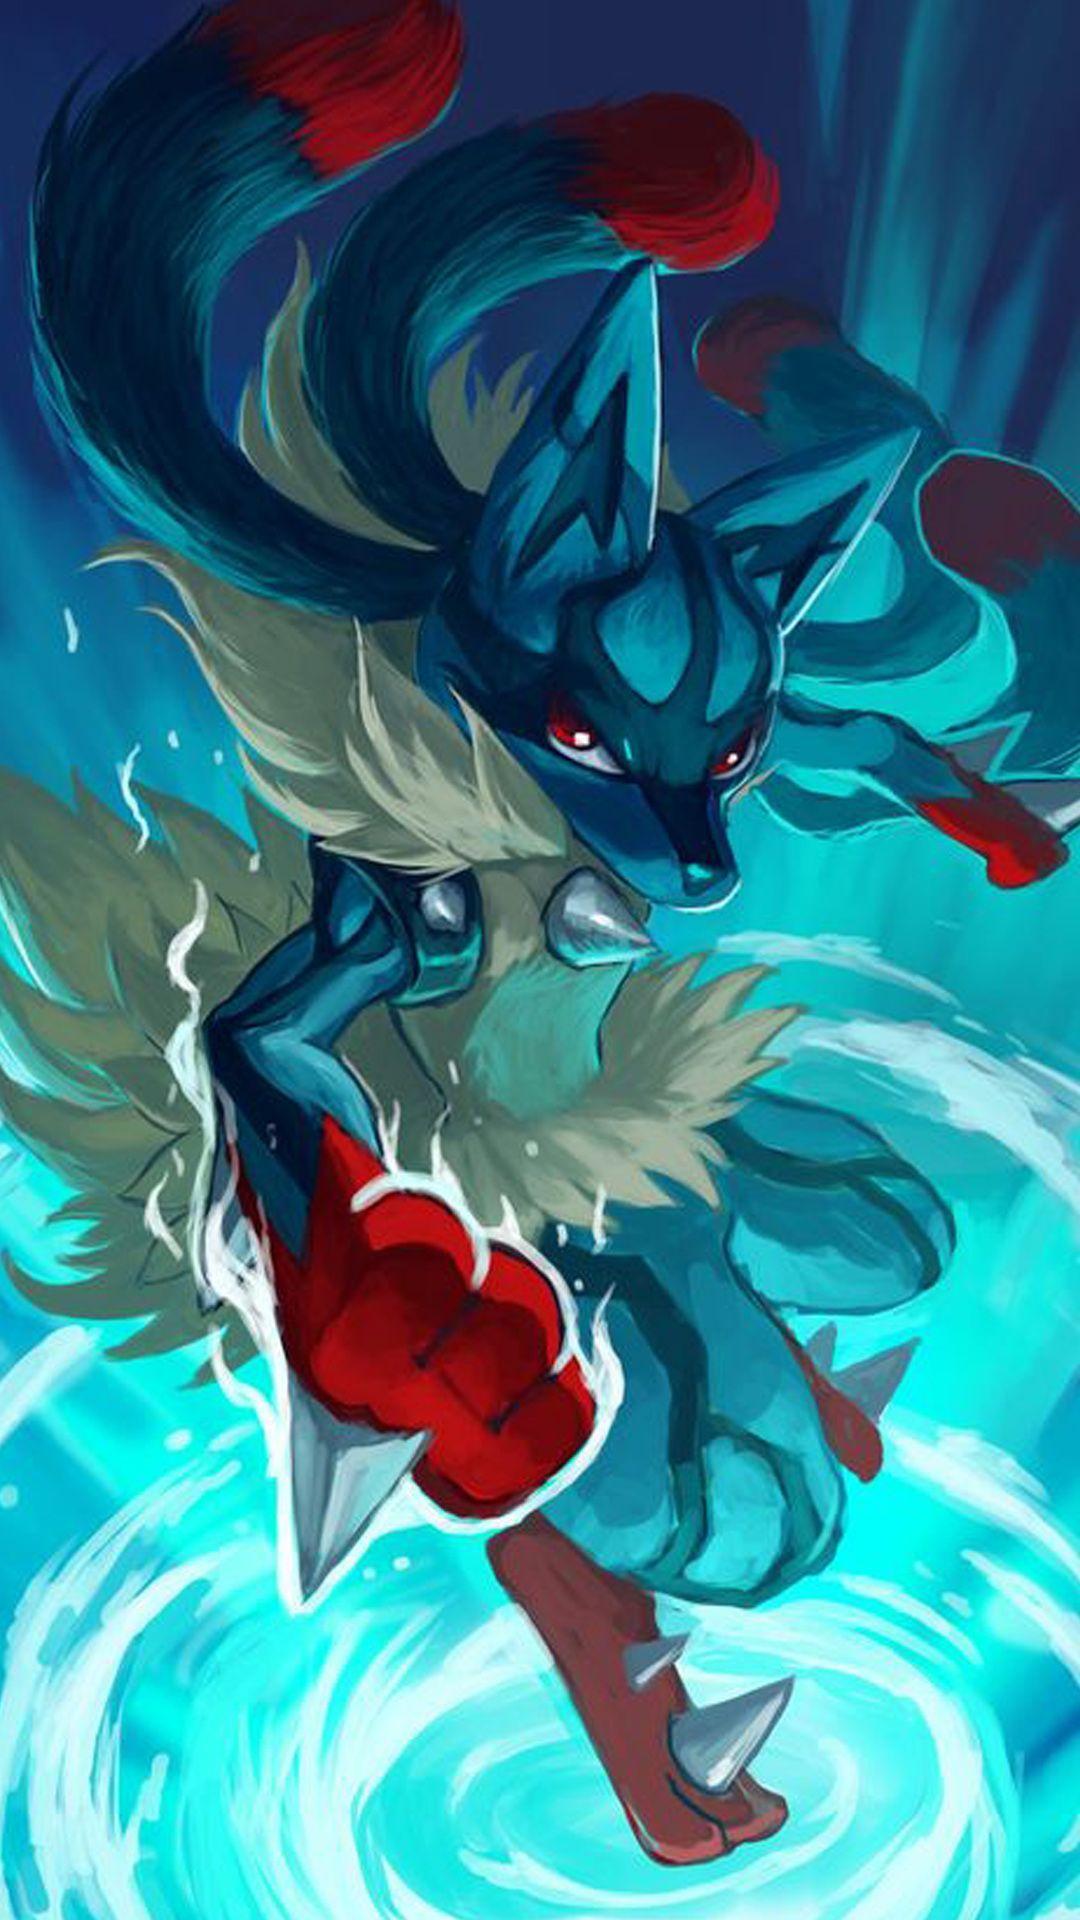 Legendary Pokemon Background Image in 2020 Pokemon